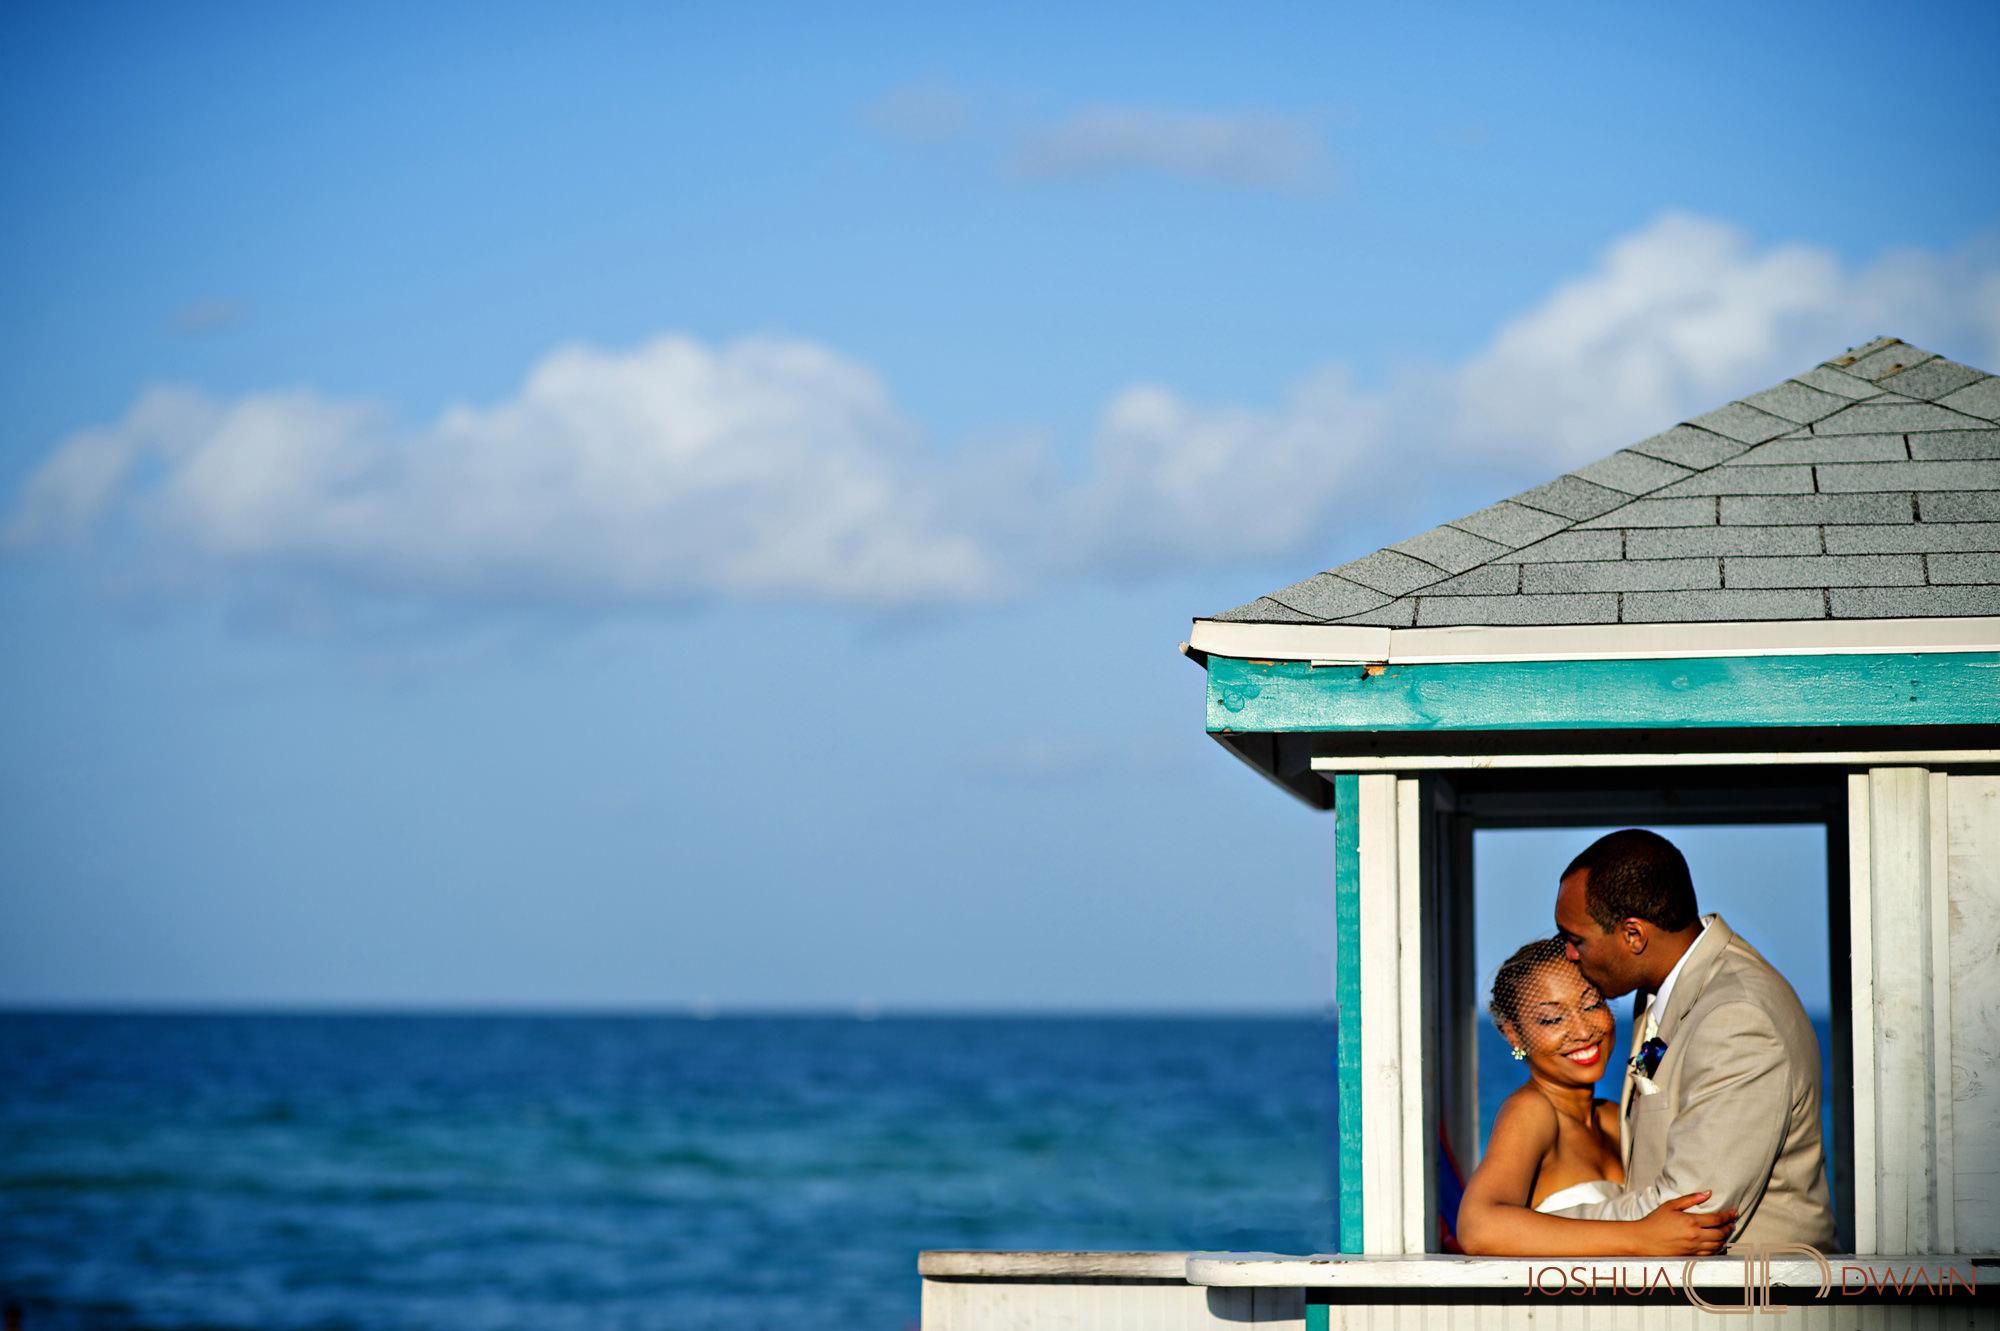 candra-alonza-001-holiday-inn-south-beach-miami-wedding-photographer-joshua-dwain-jd4_8233